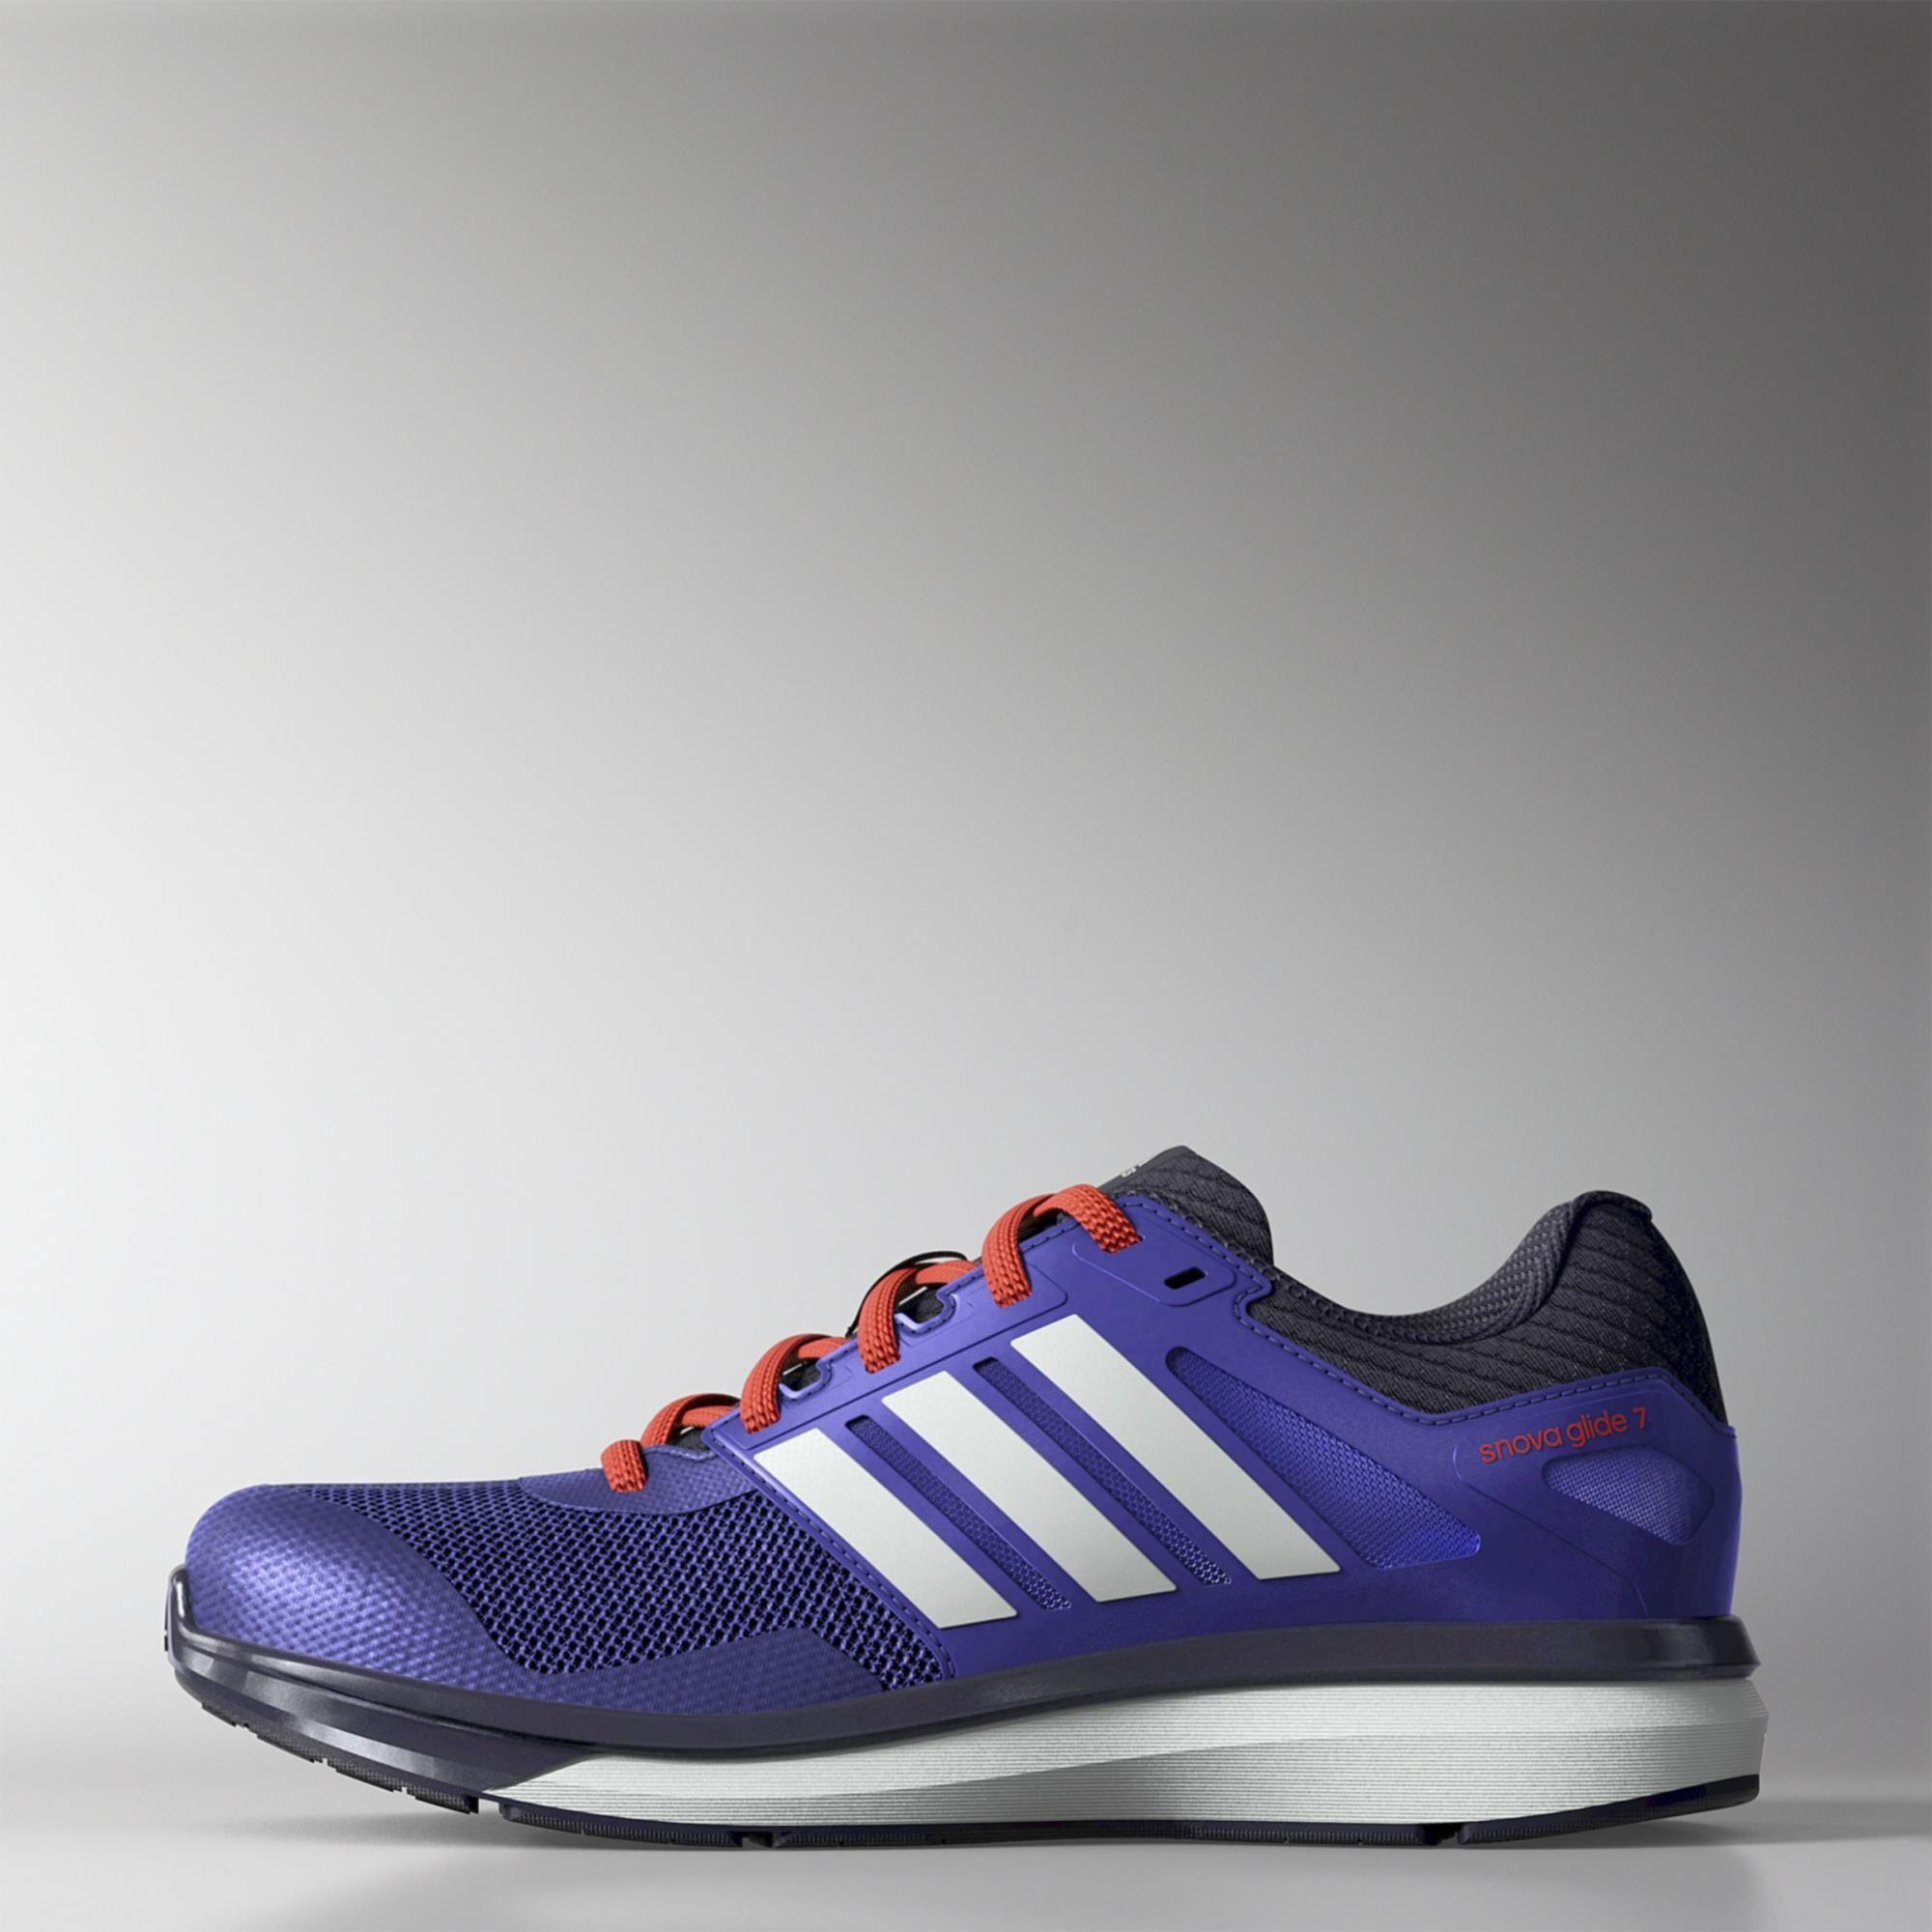 a0de8dd52 Adidas Kids Supernova Glide 7 Running Shoes - Purple Black - Tennisnuts.com